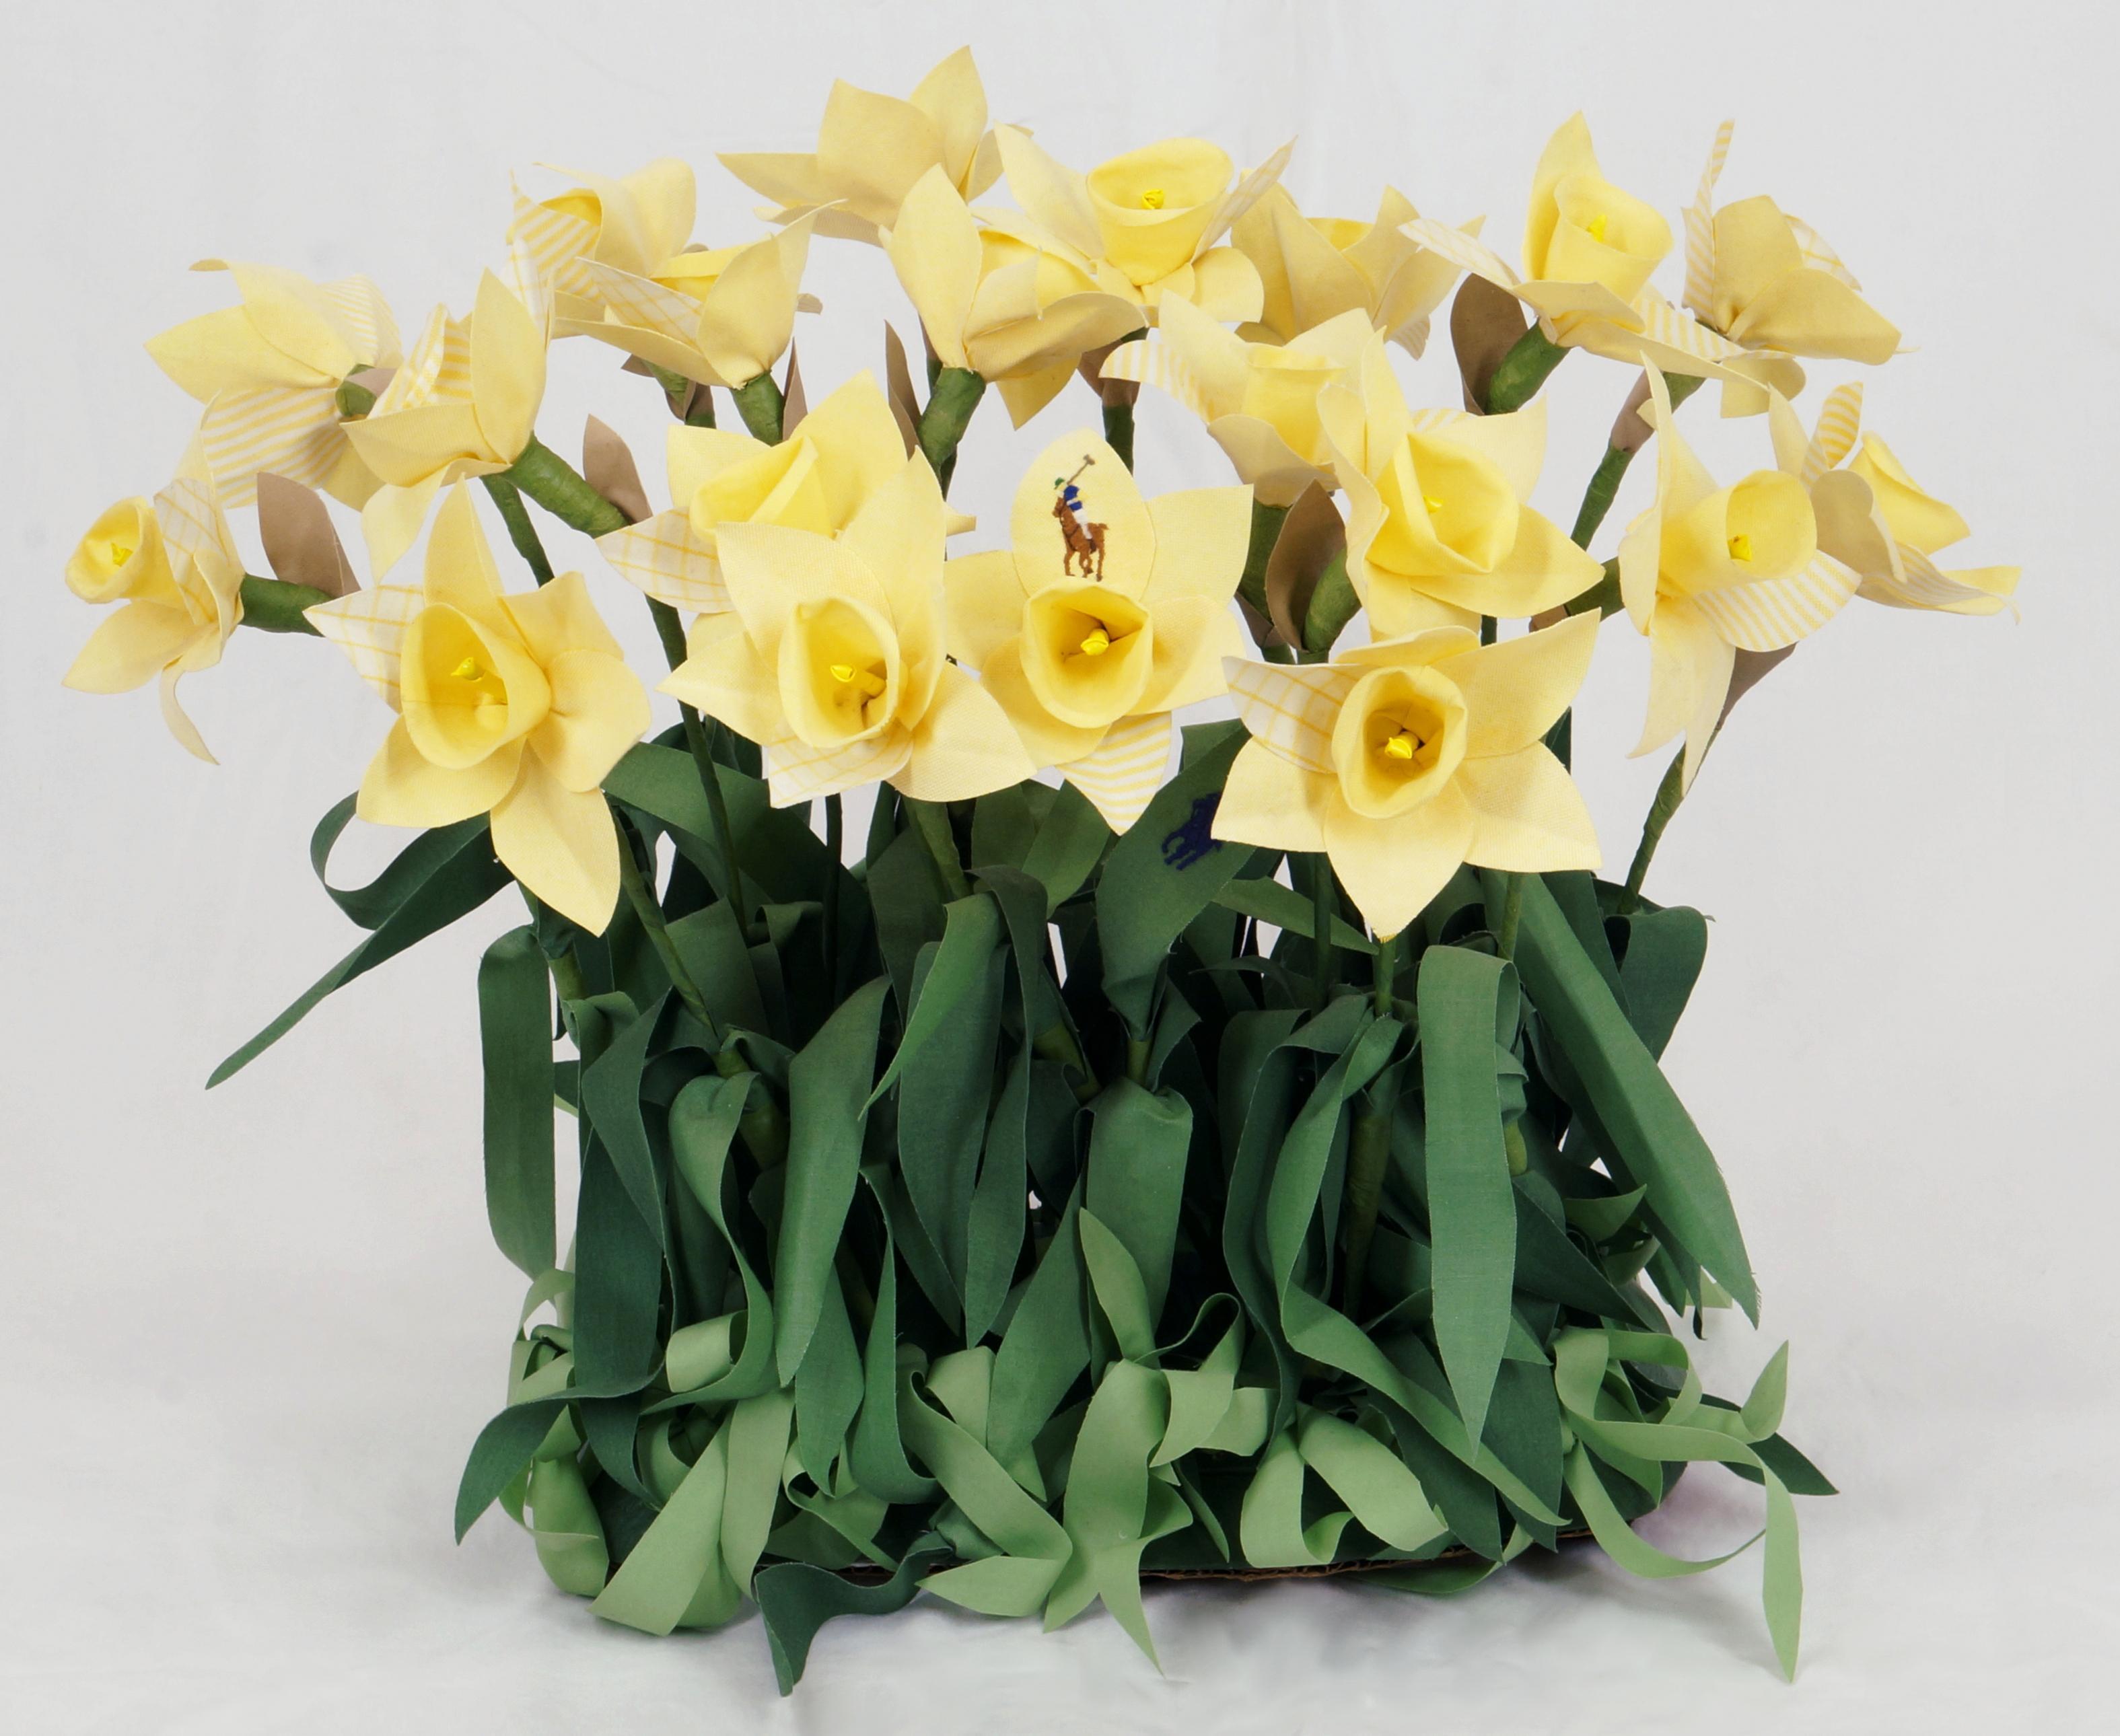 Branded Daffodils